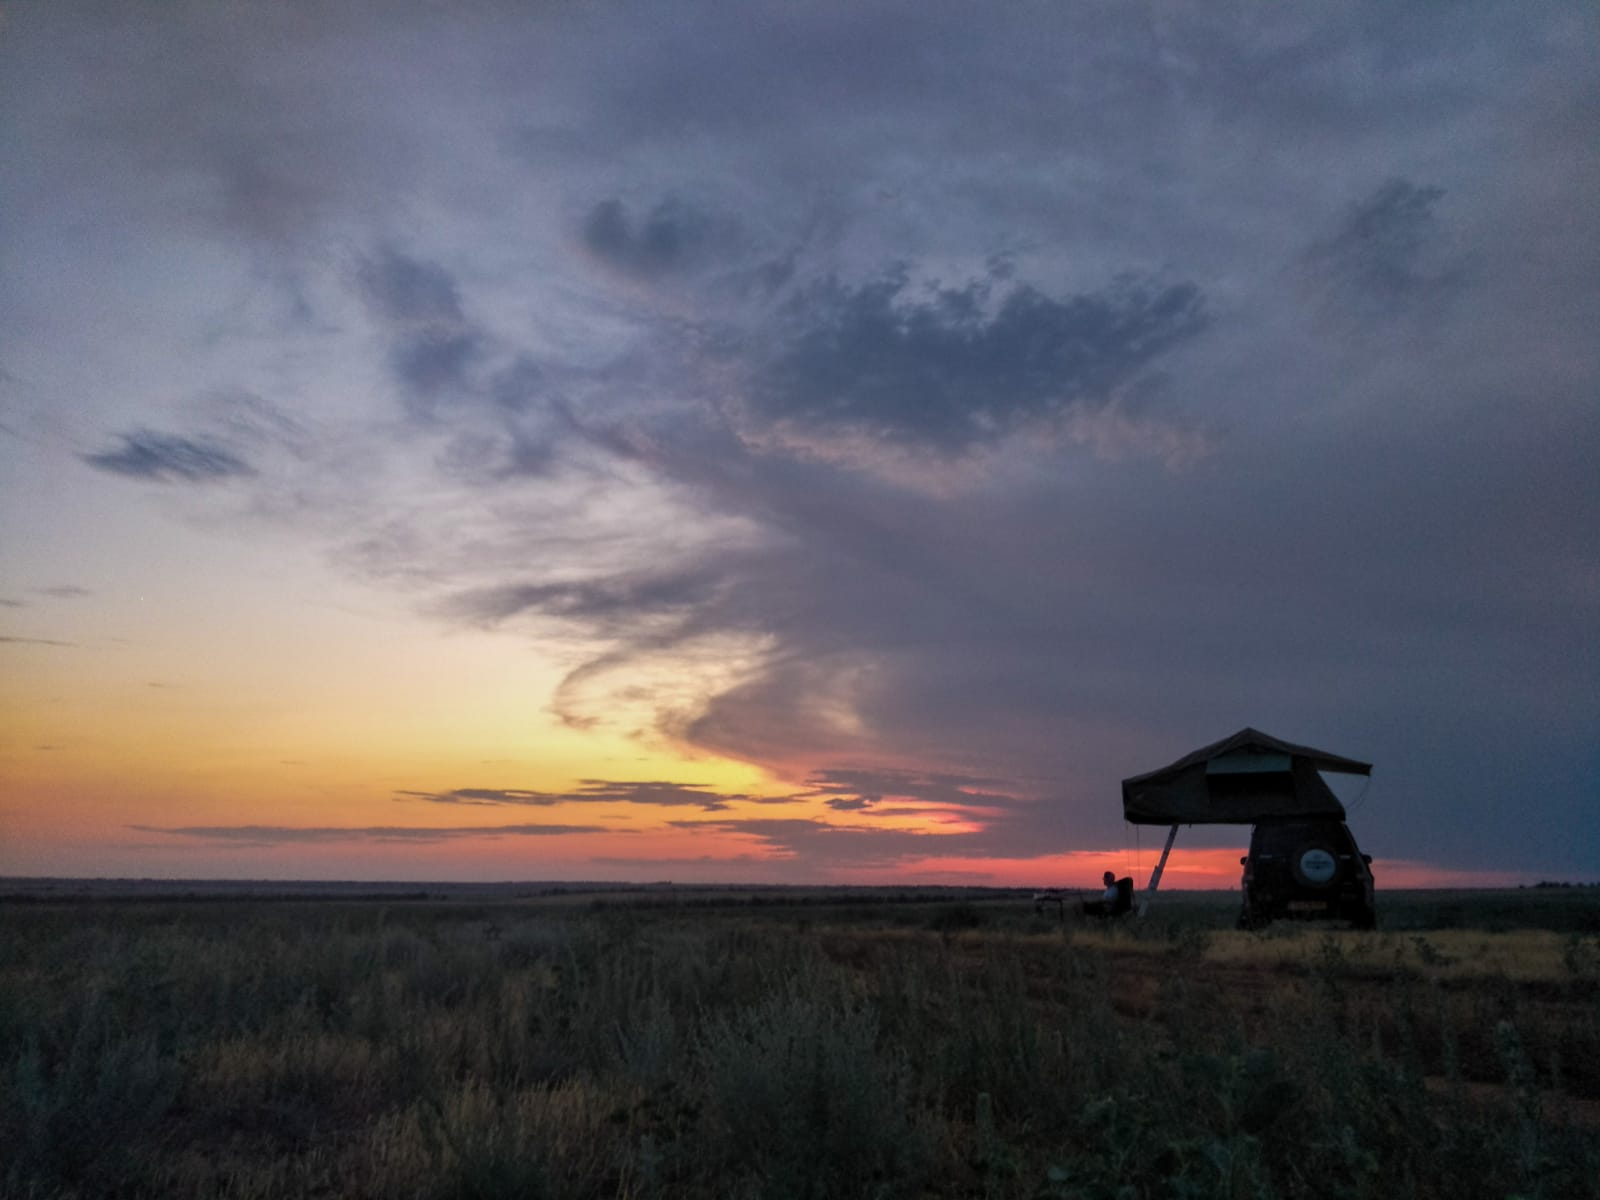 Overlanding 4x4 sunset